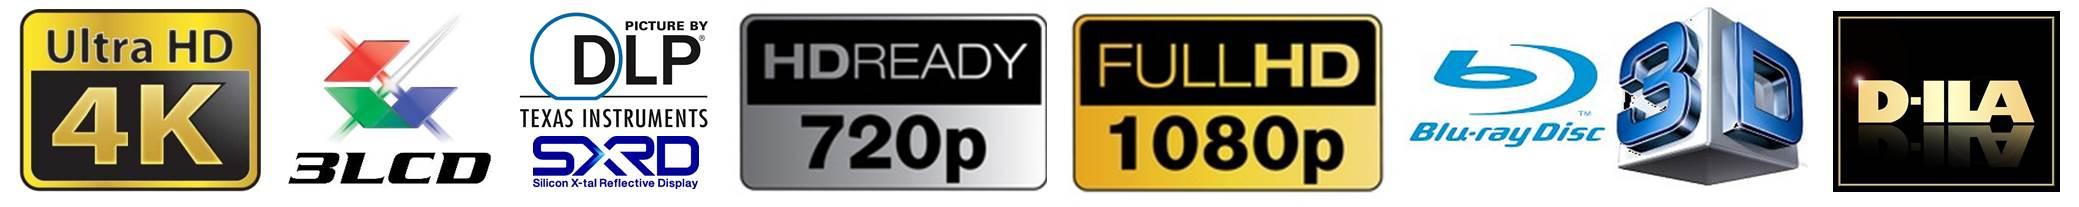 Logo - Kaufberatung Heinkino Beamer 4K, FullHD, HD, 3D, D-ILA, SCRD, LCD und DLP